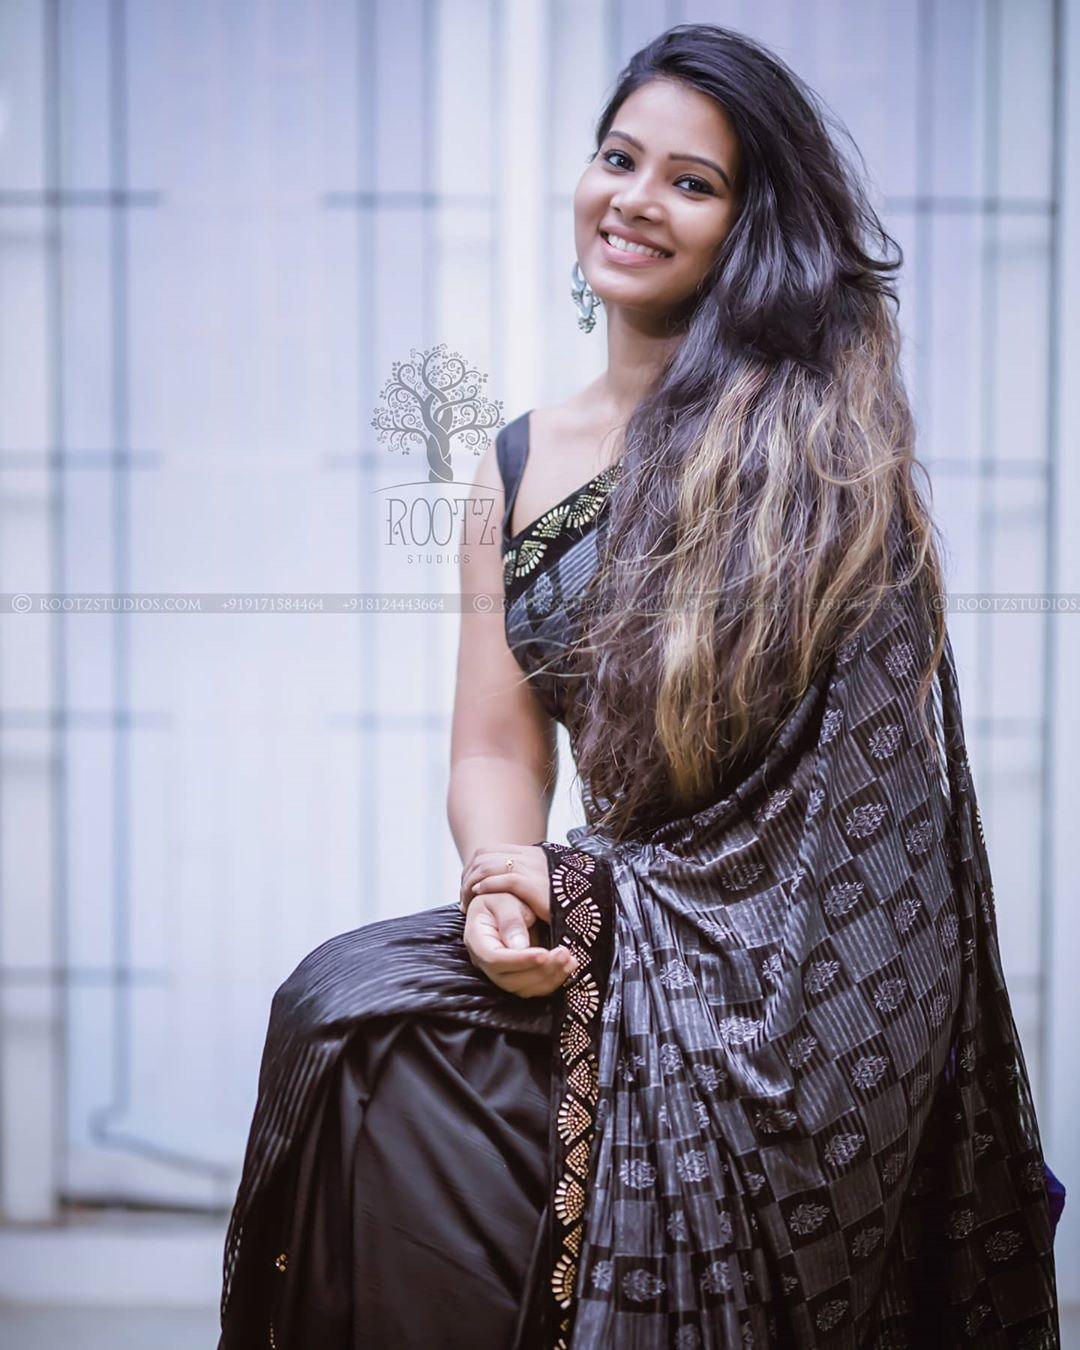 dhivya dhuraisamy homely saree photos (5)